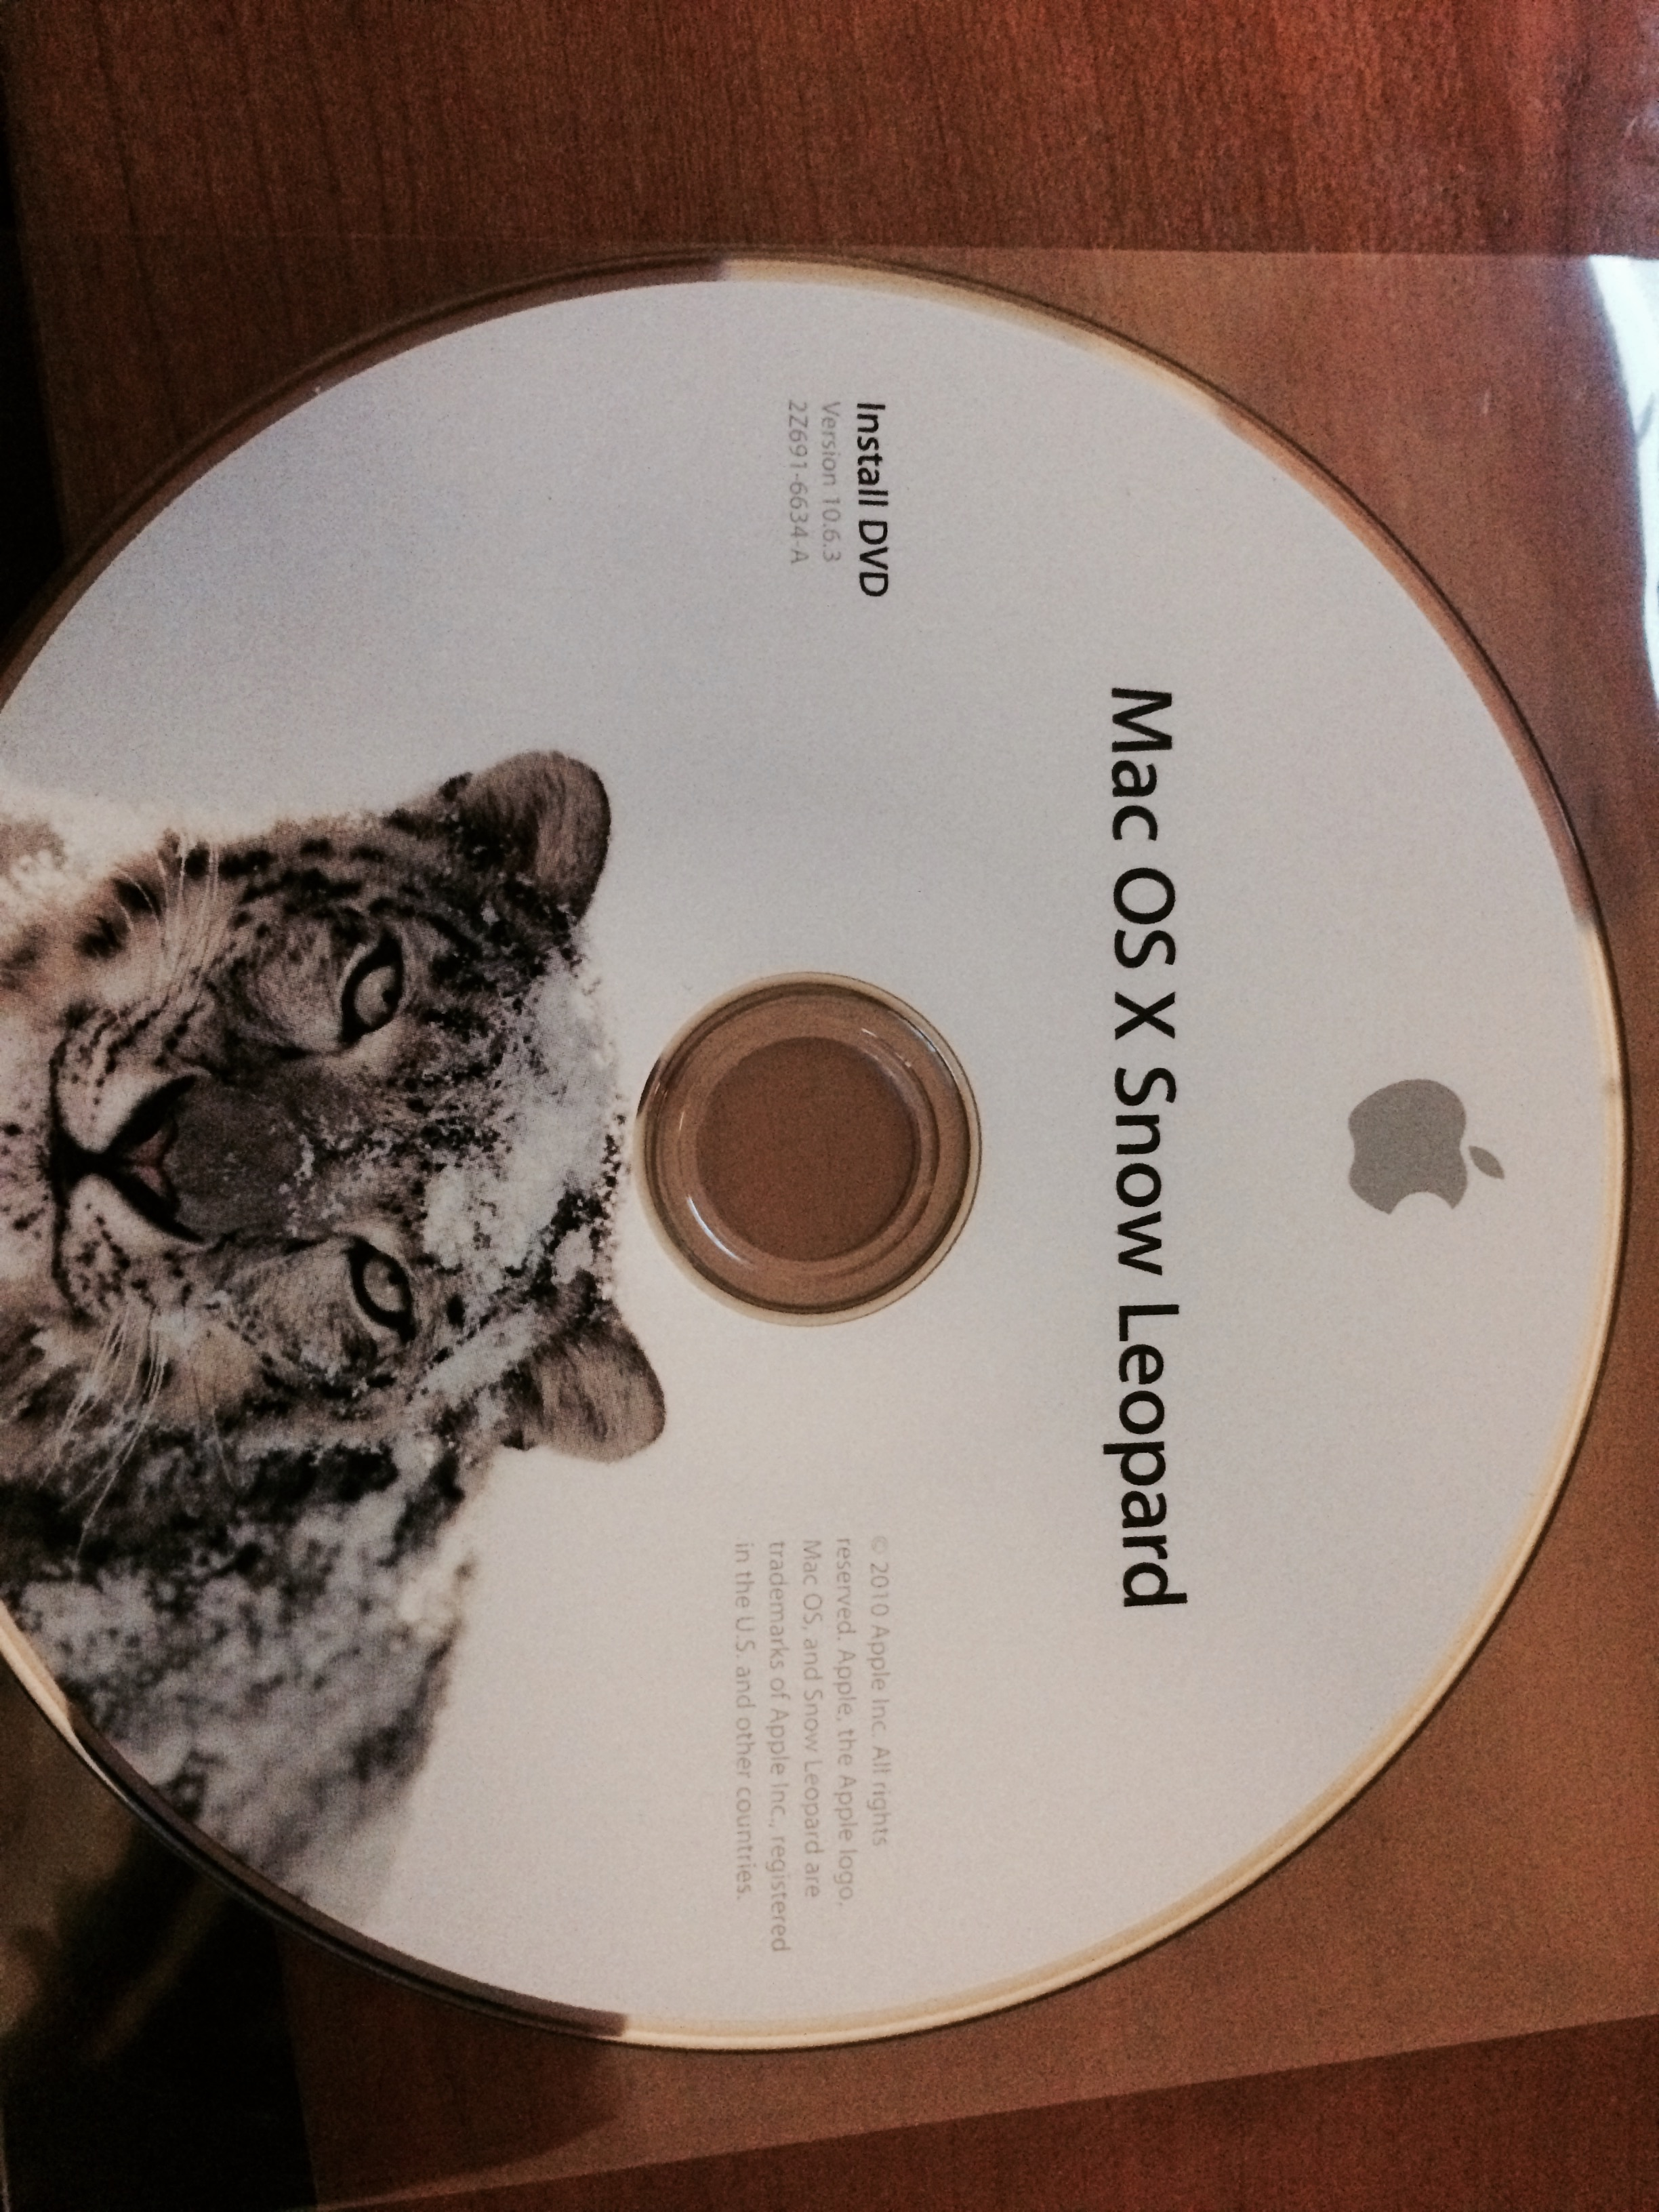 Snow Leopard install disc fails on 4,1 Ma… - Apple Community